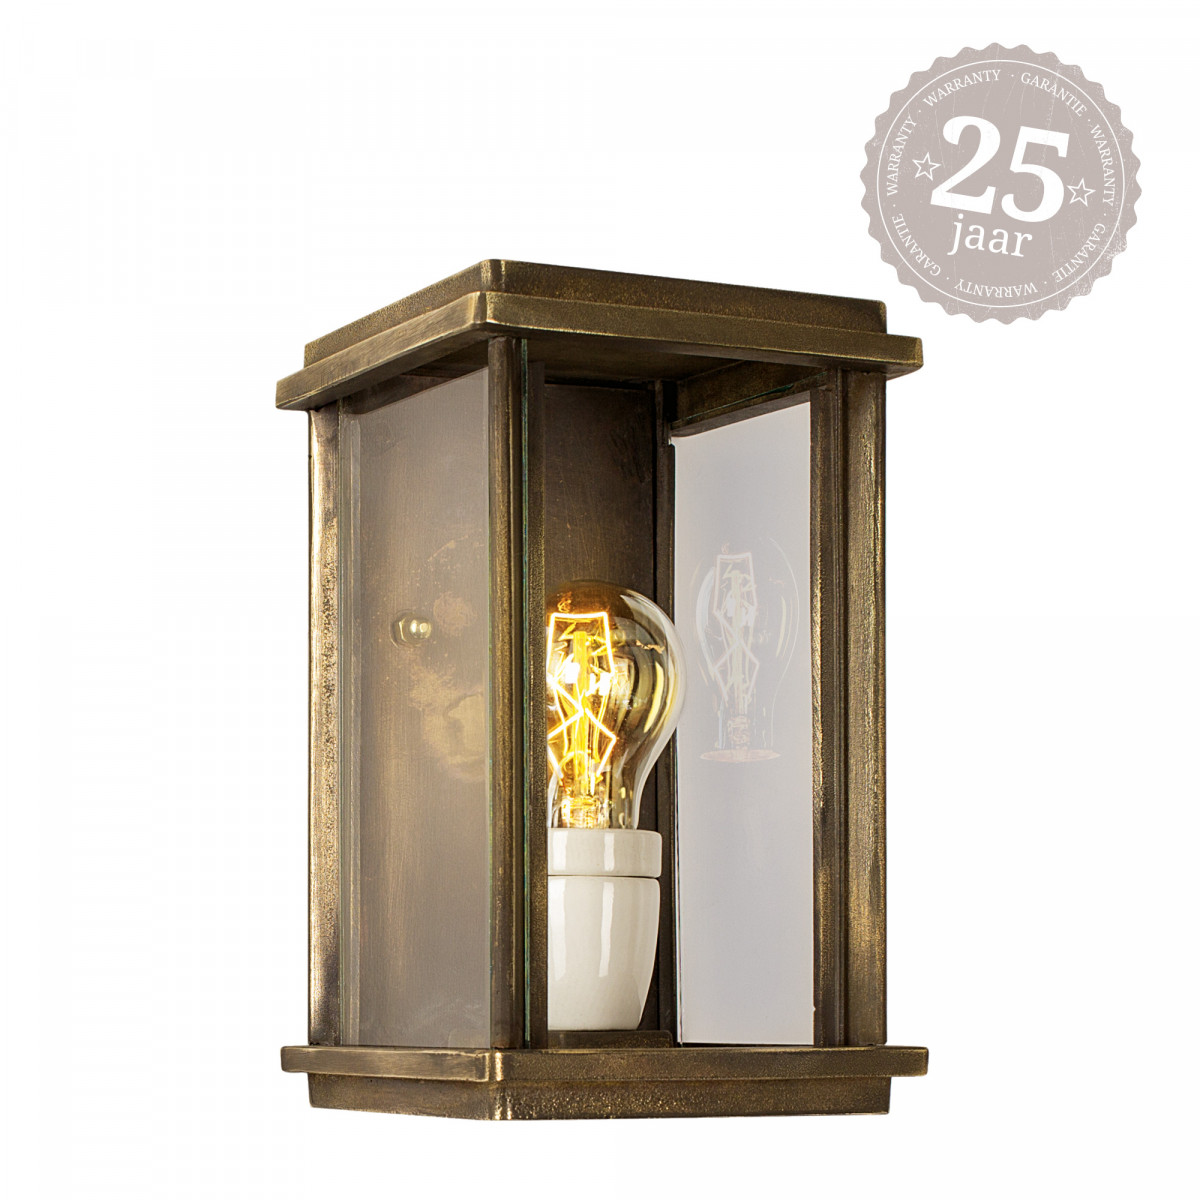 Muurlamp Capital S brons